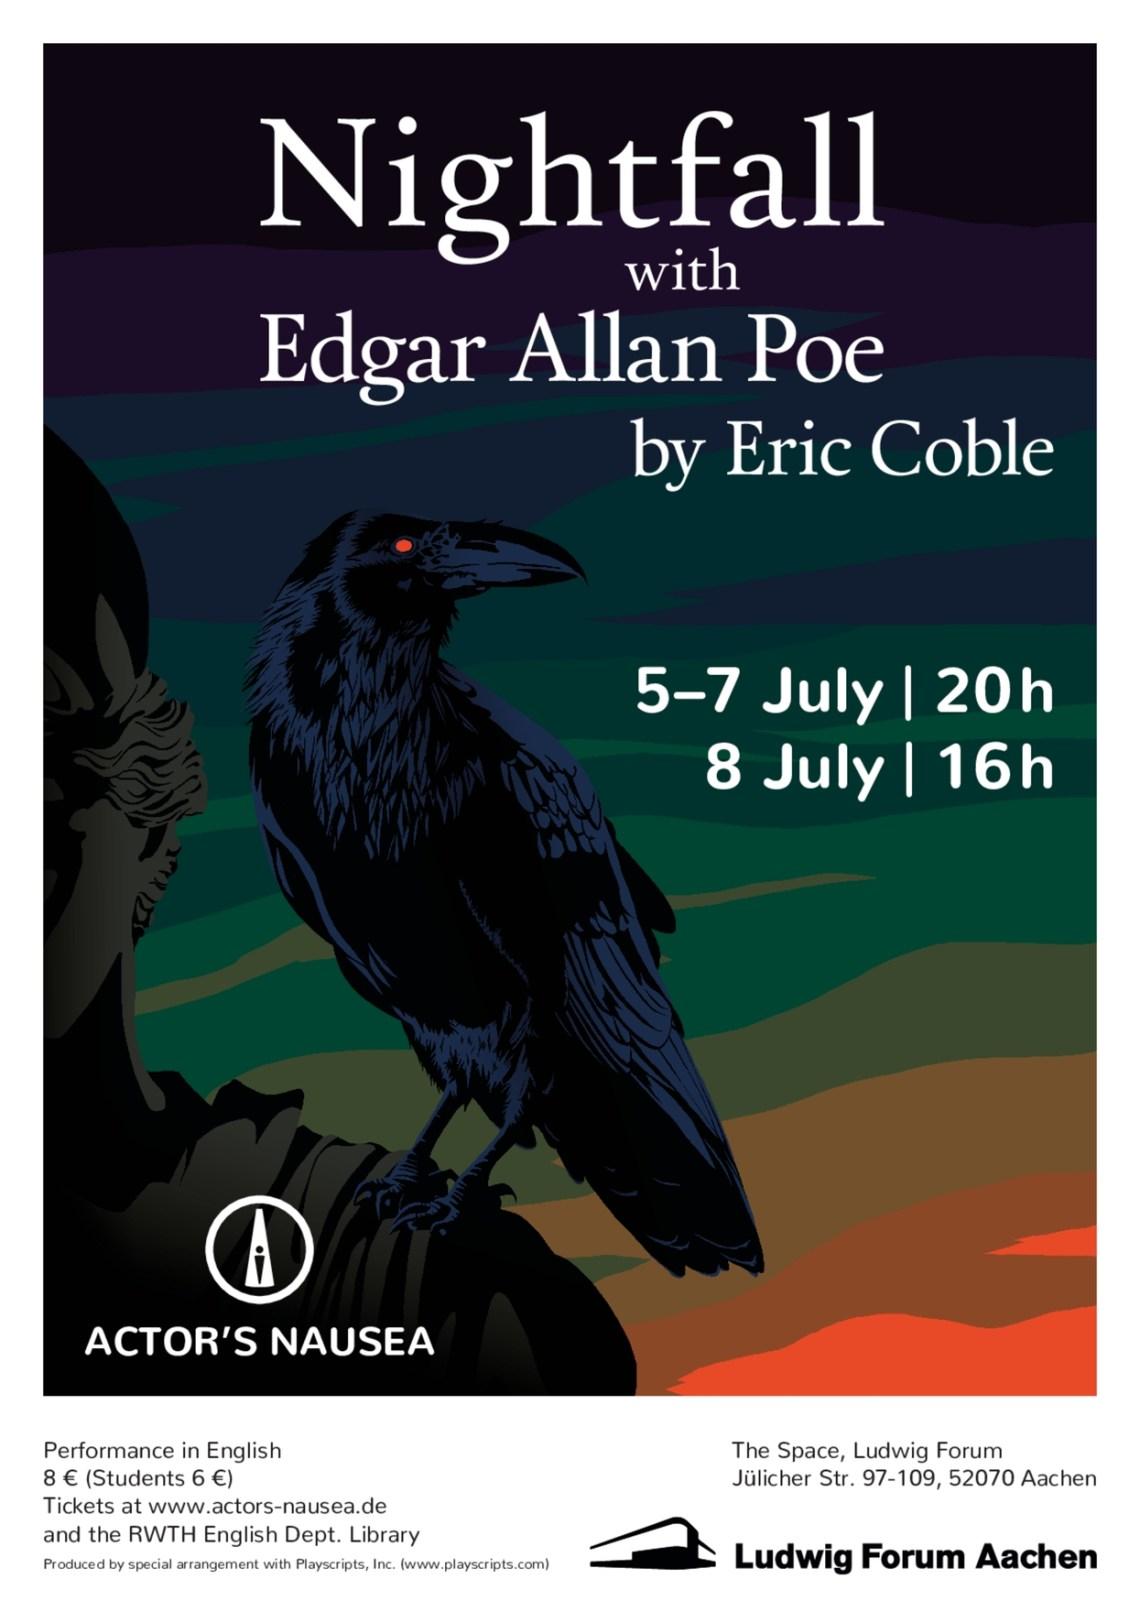 Nightfall with Edgar Allan Poe - Poster by Lilian Kojan